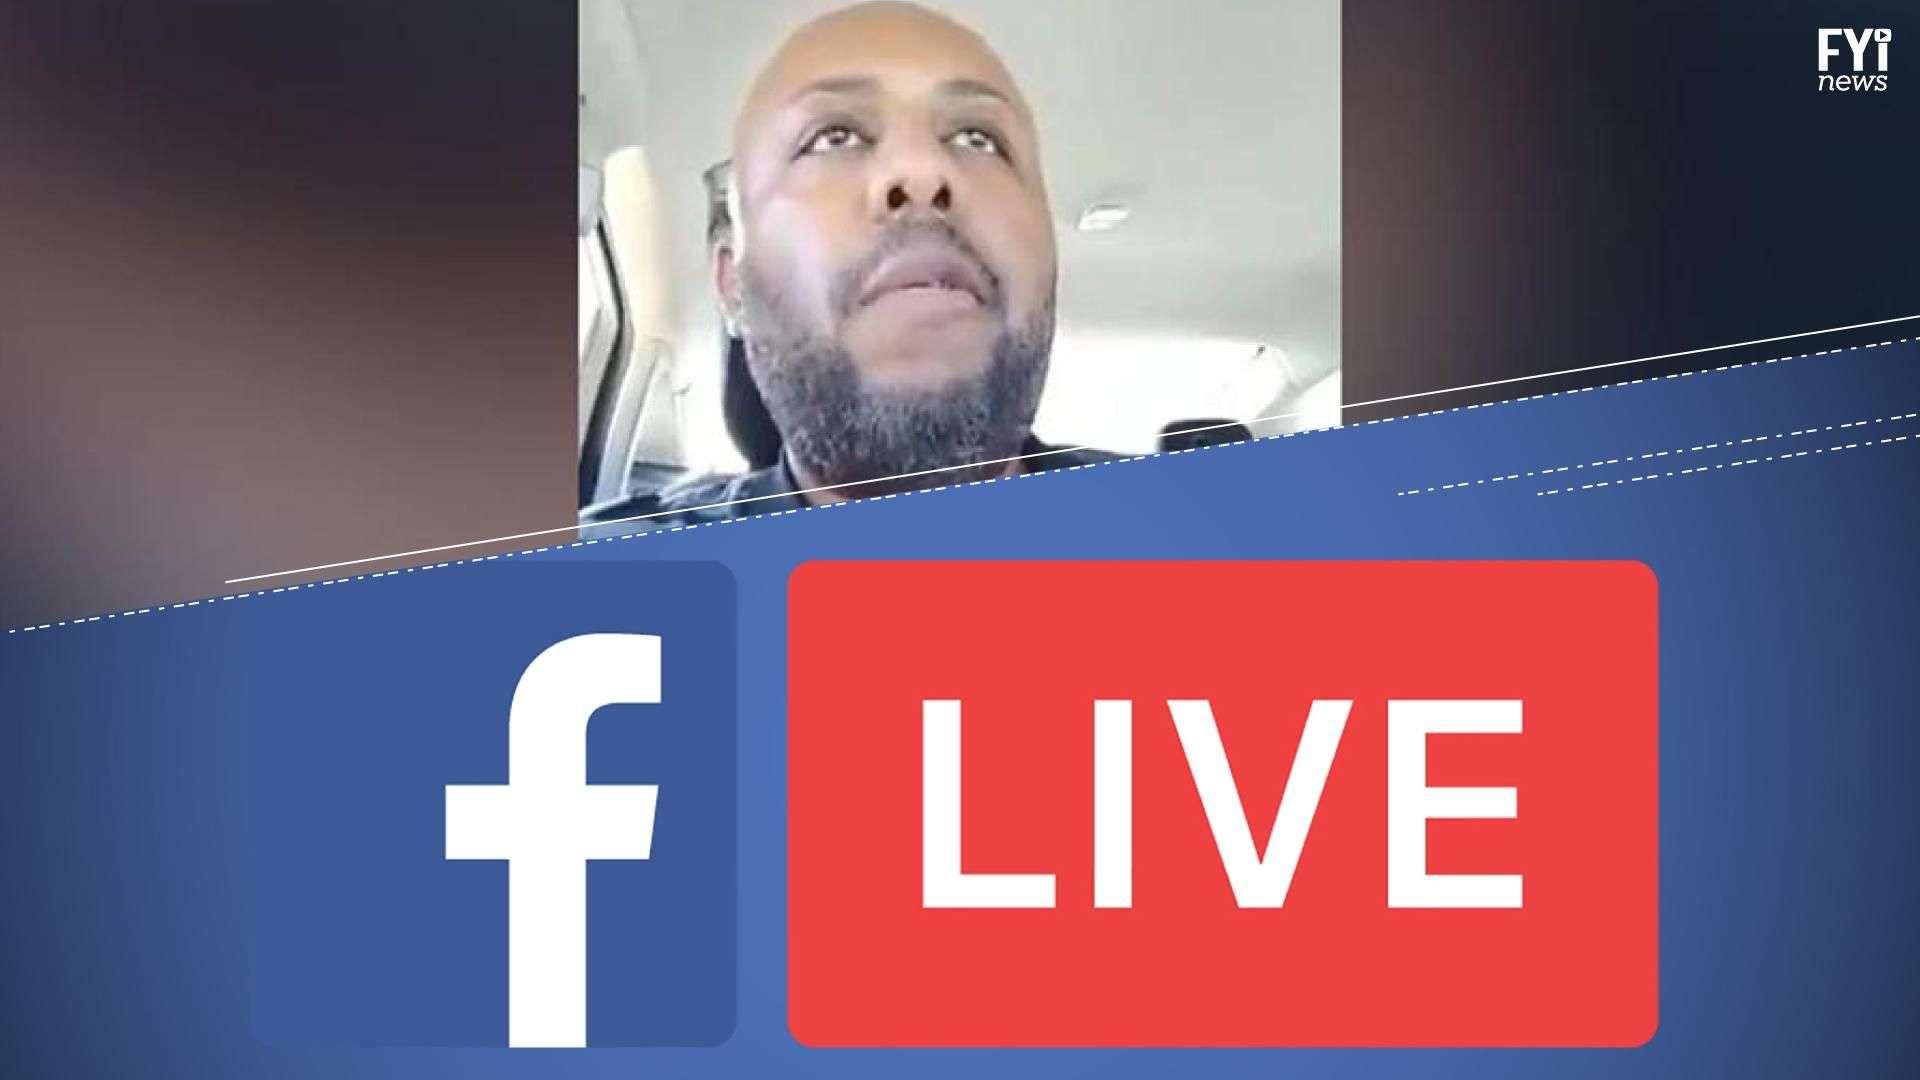 Mata a sus víctimas a través de Facebook Live